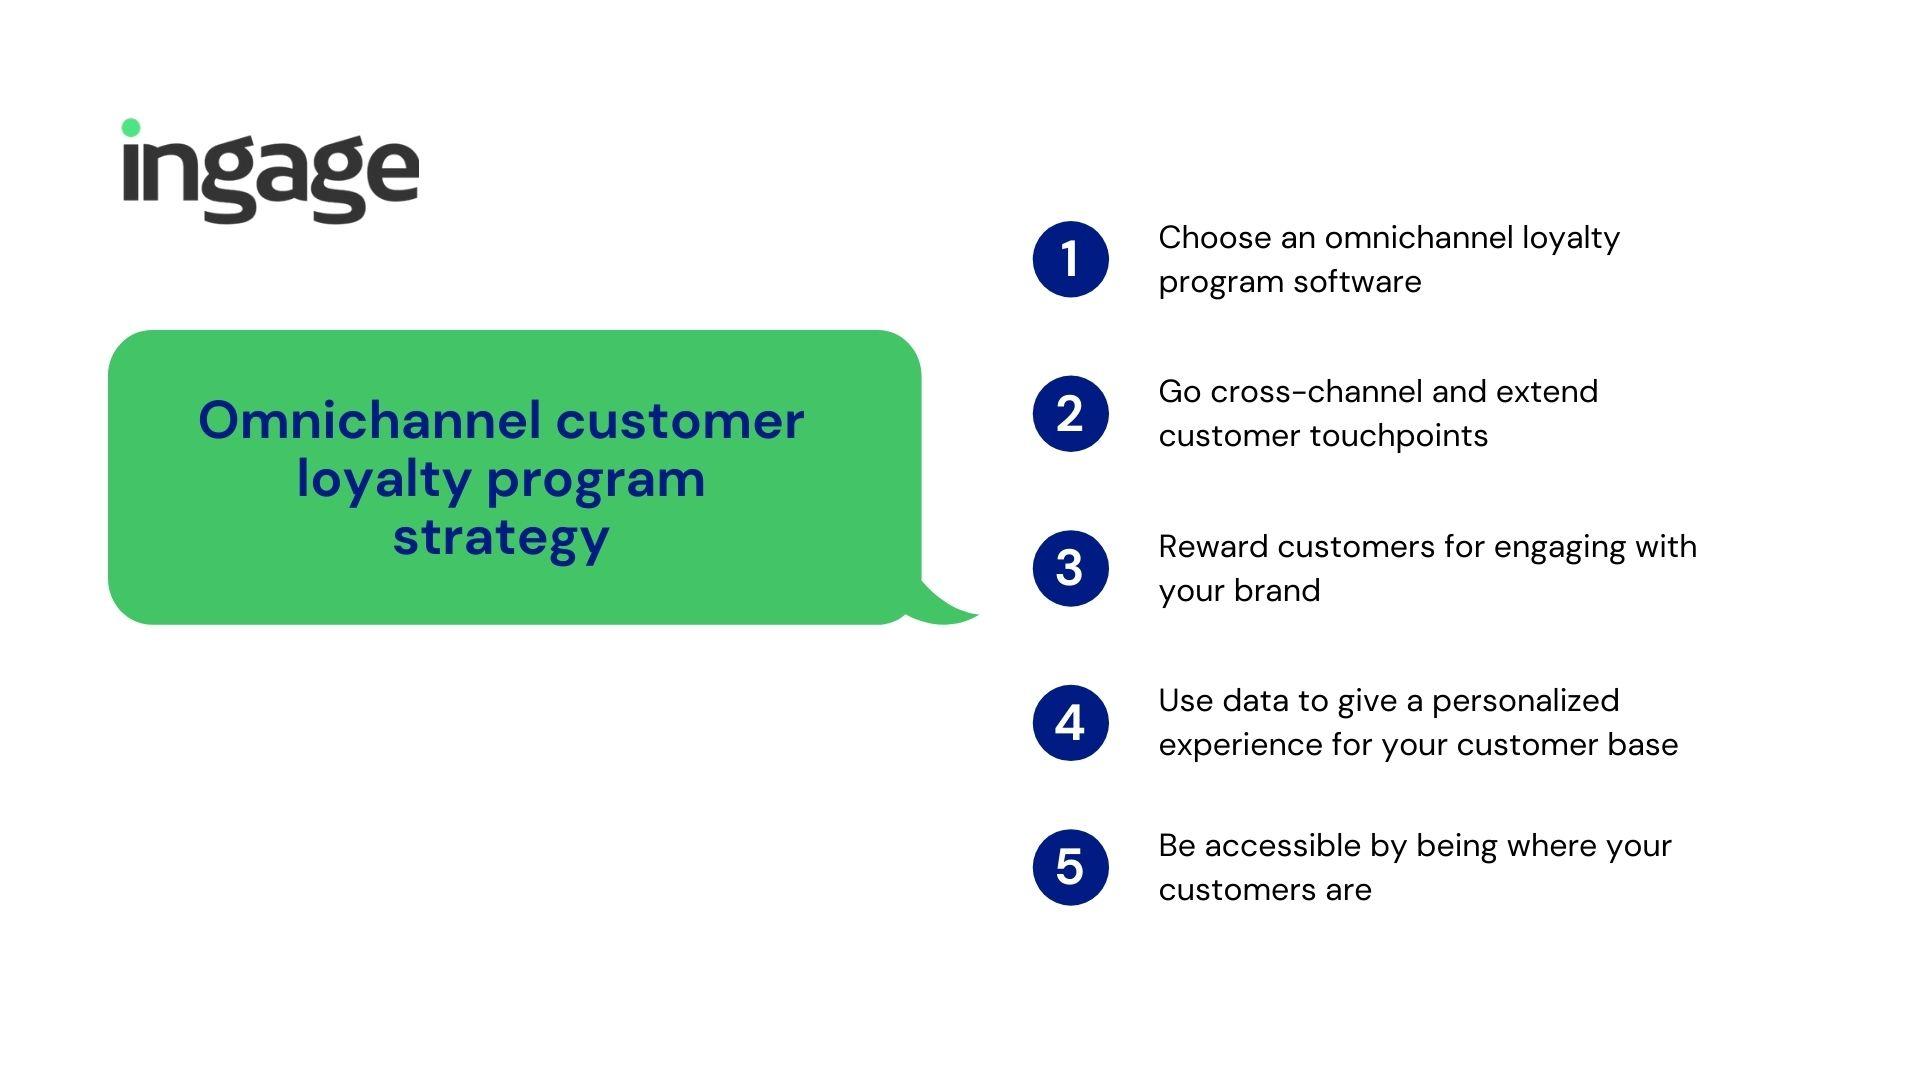 Omnichannel customer loyalty program strategy